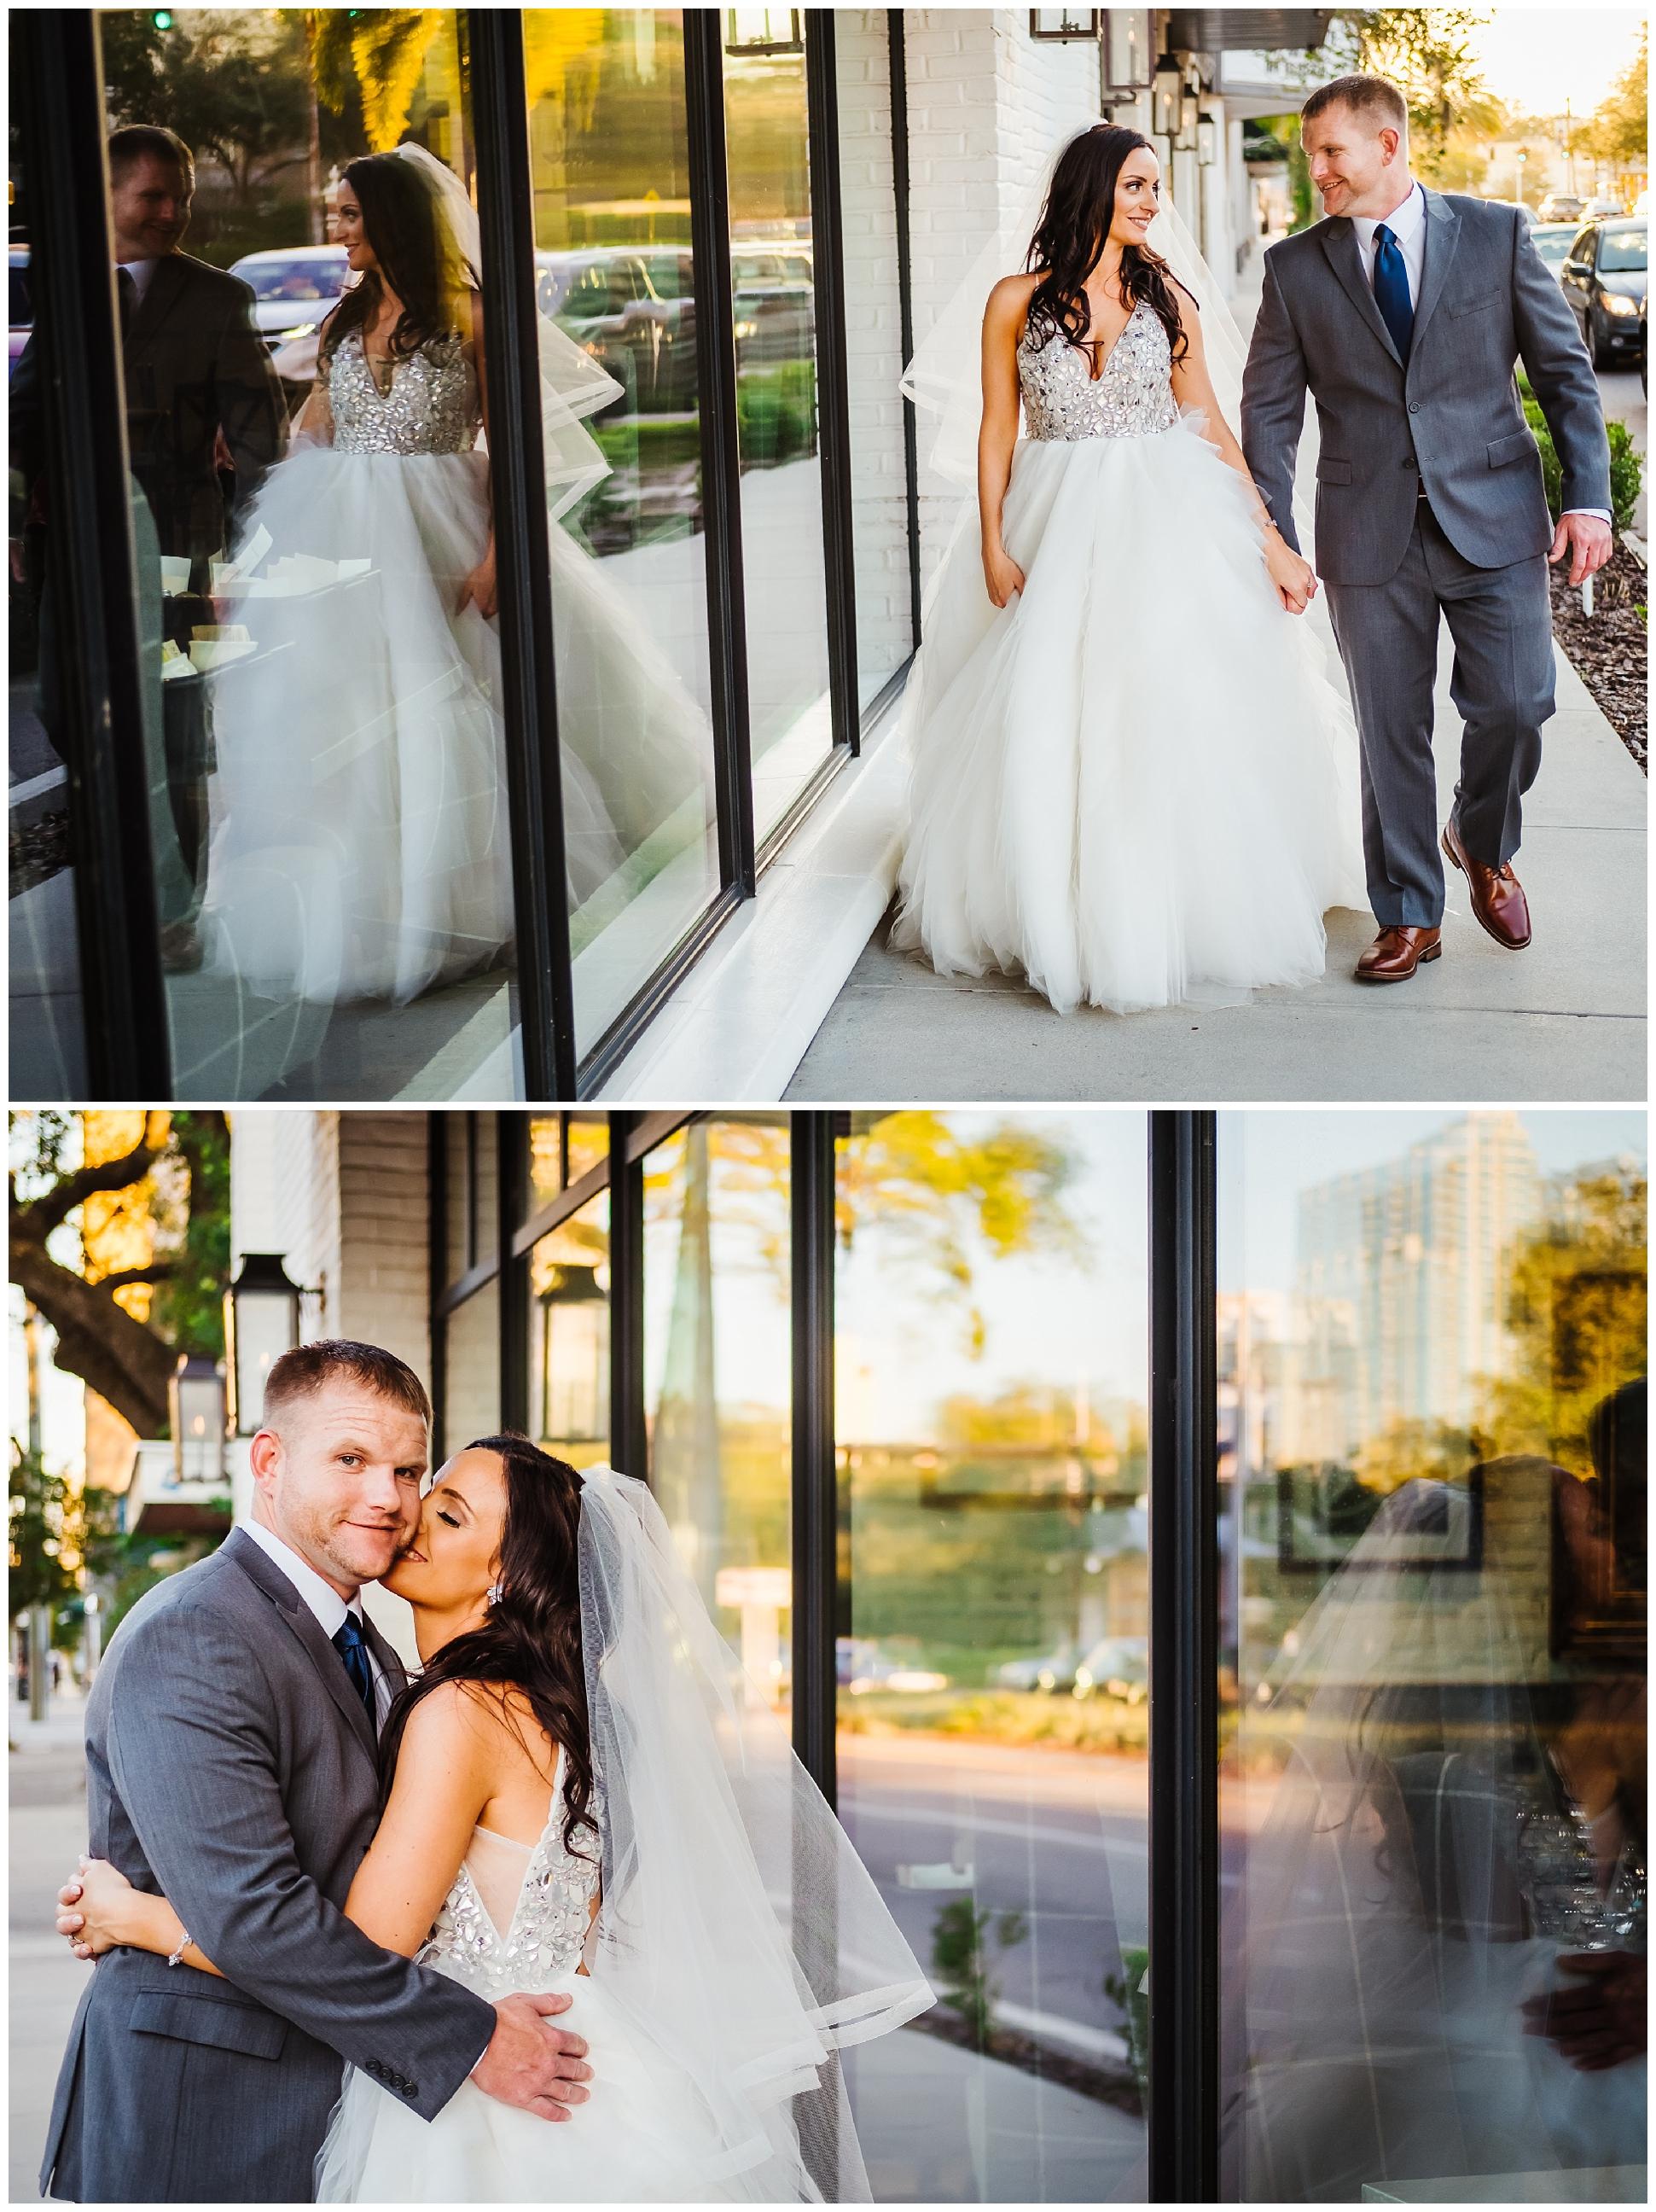 tampa-wedding-photographer-oxford-exchange-garland-candlelight-gold-hayley-paige_0030.jpg